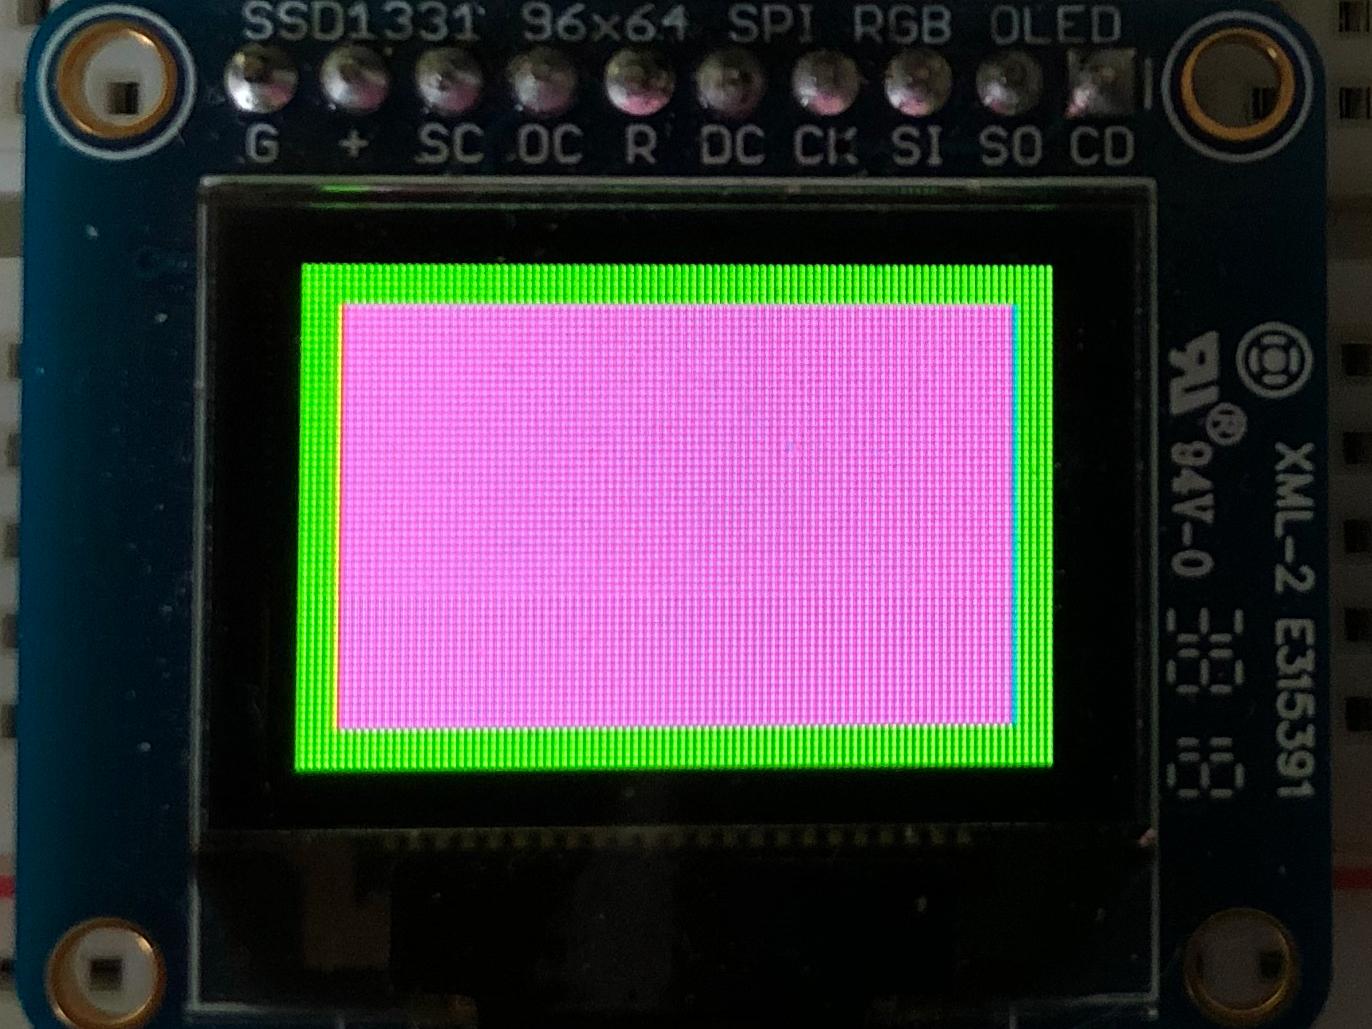 arduino_compatibles_ssd1331-green-purple.jpg